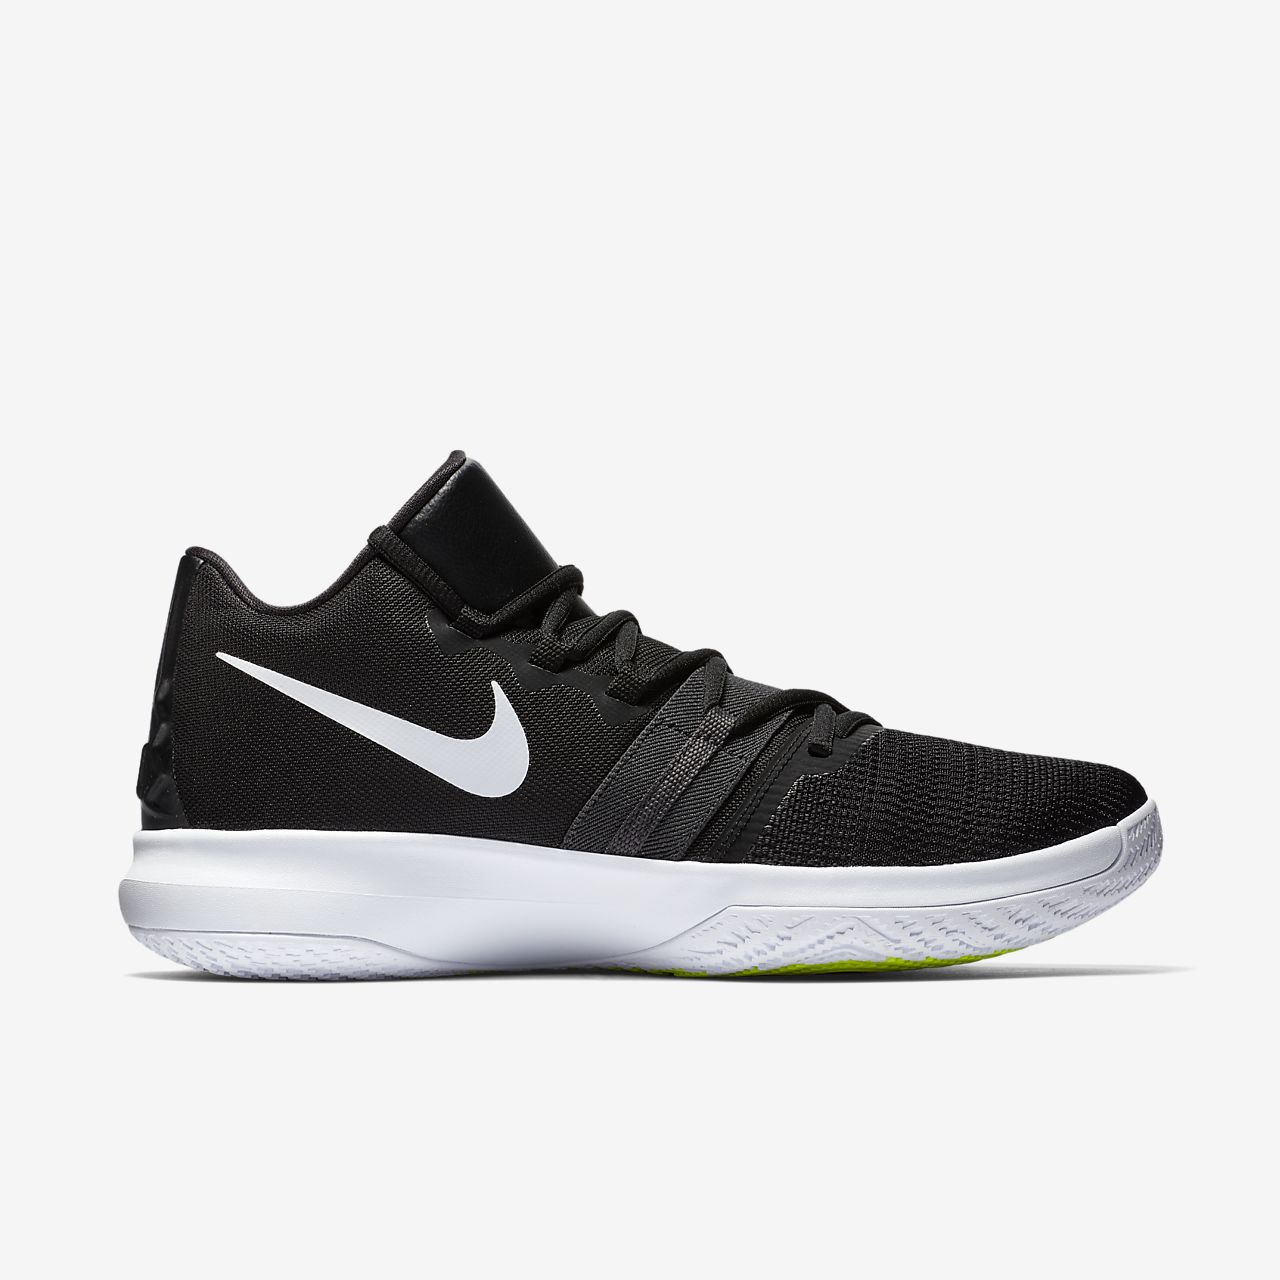 Kyrie Flytrap Basketball Shoe GB